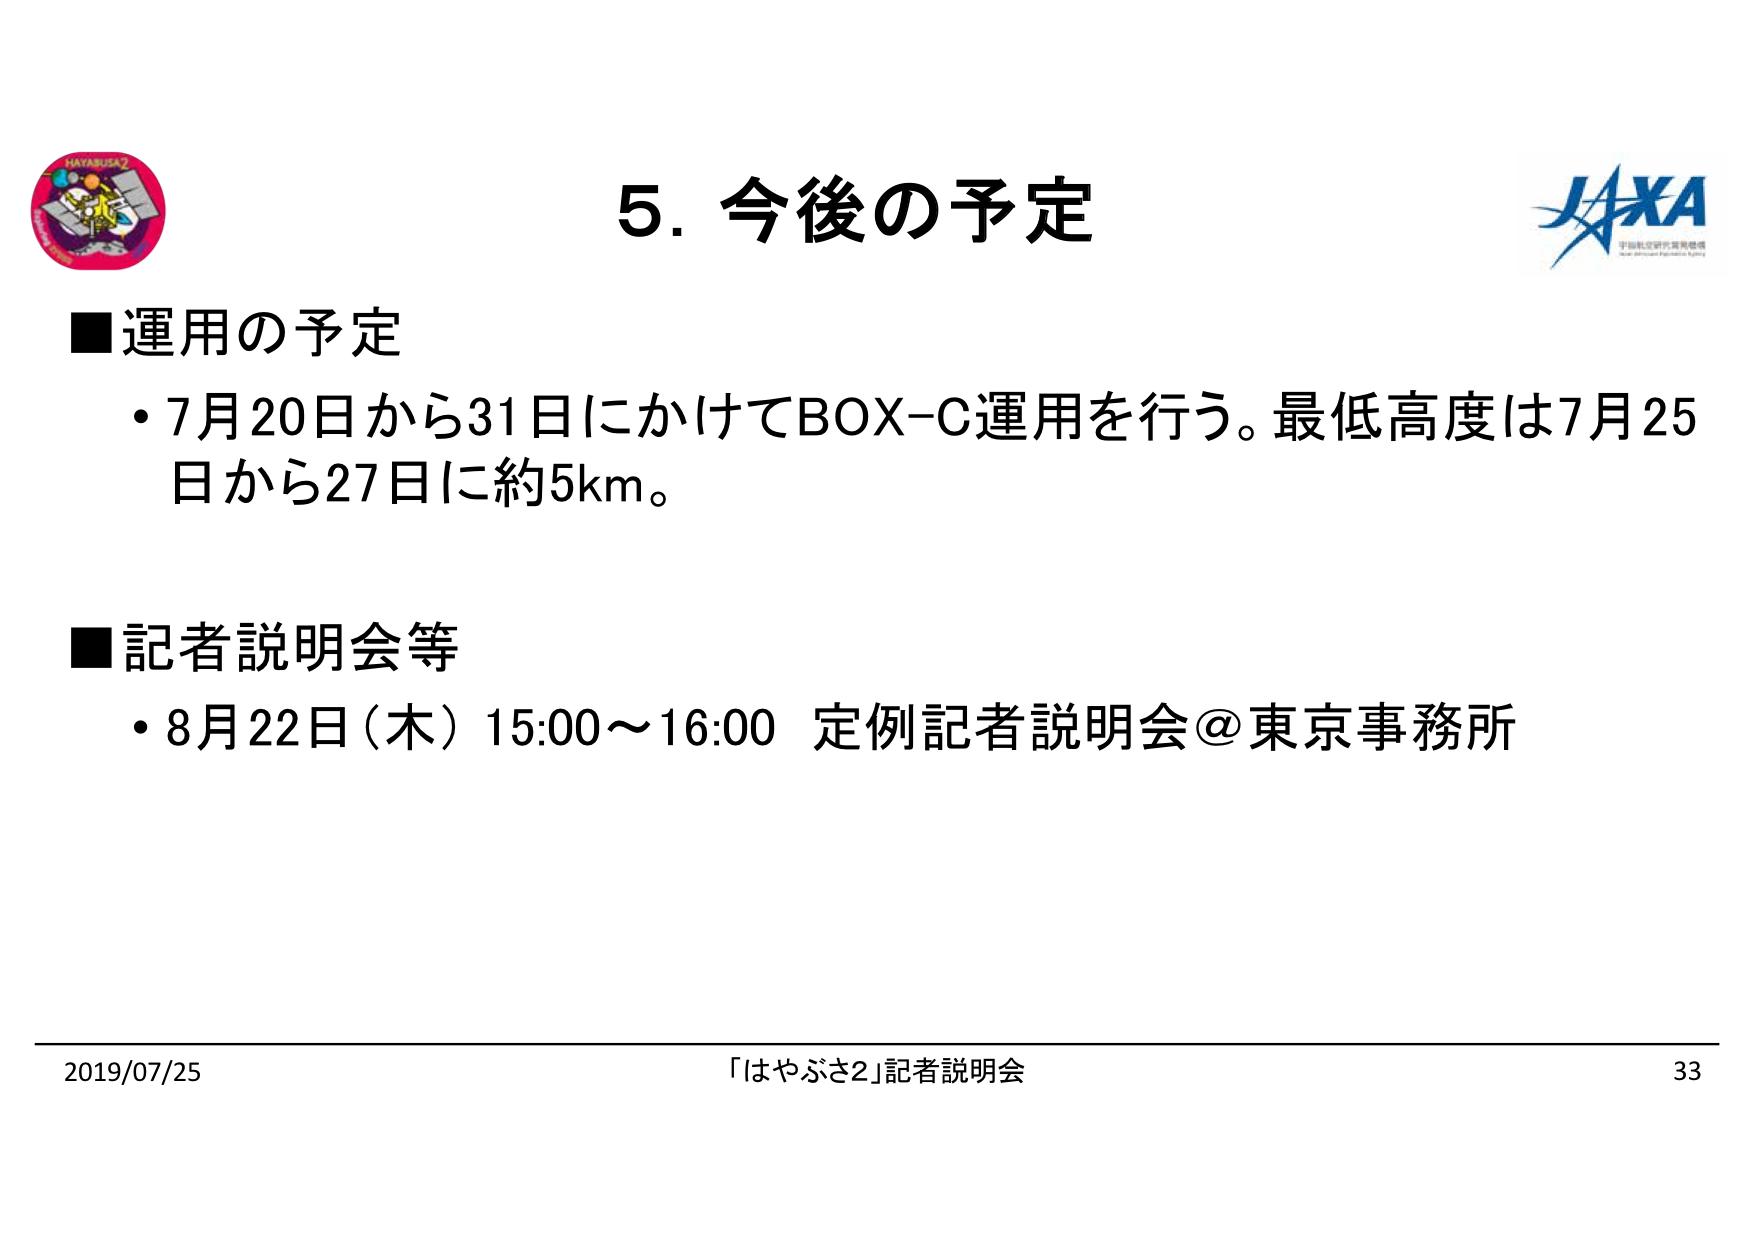 f:id:Imamura:20190725151416p:plain